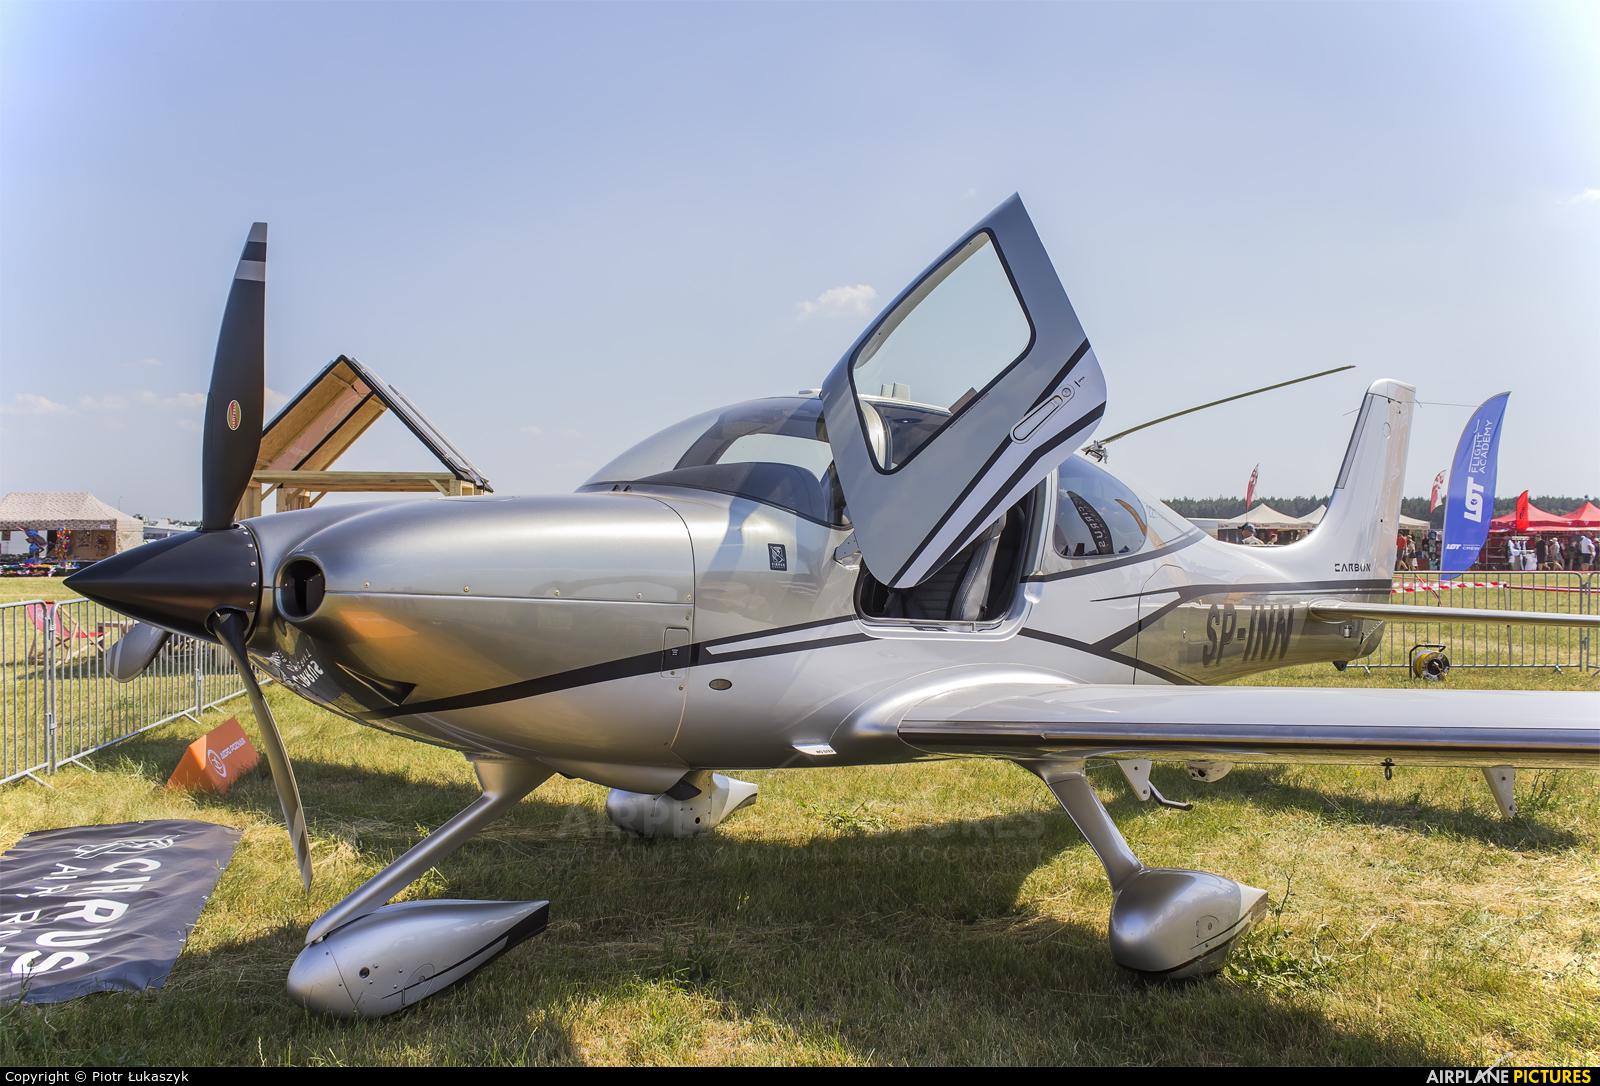 Private SP-INN aircraft at Leszno - Strzyżewice